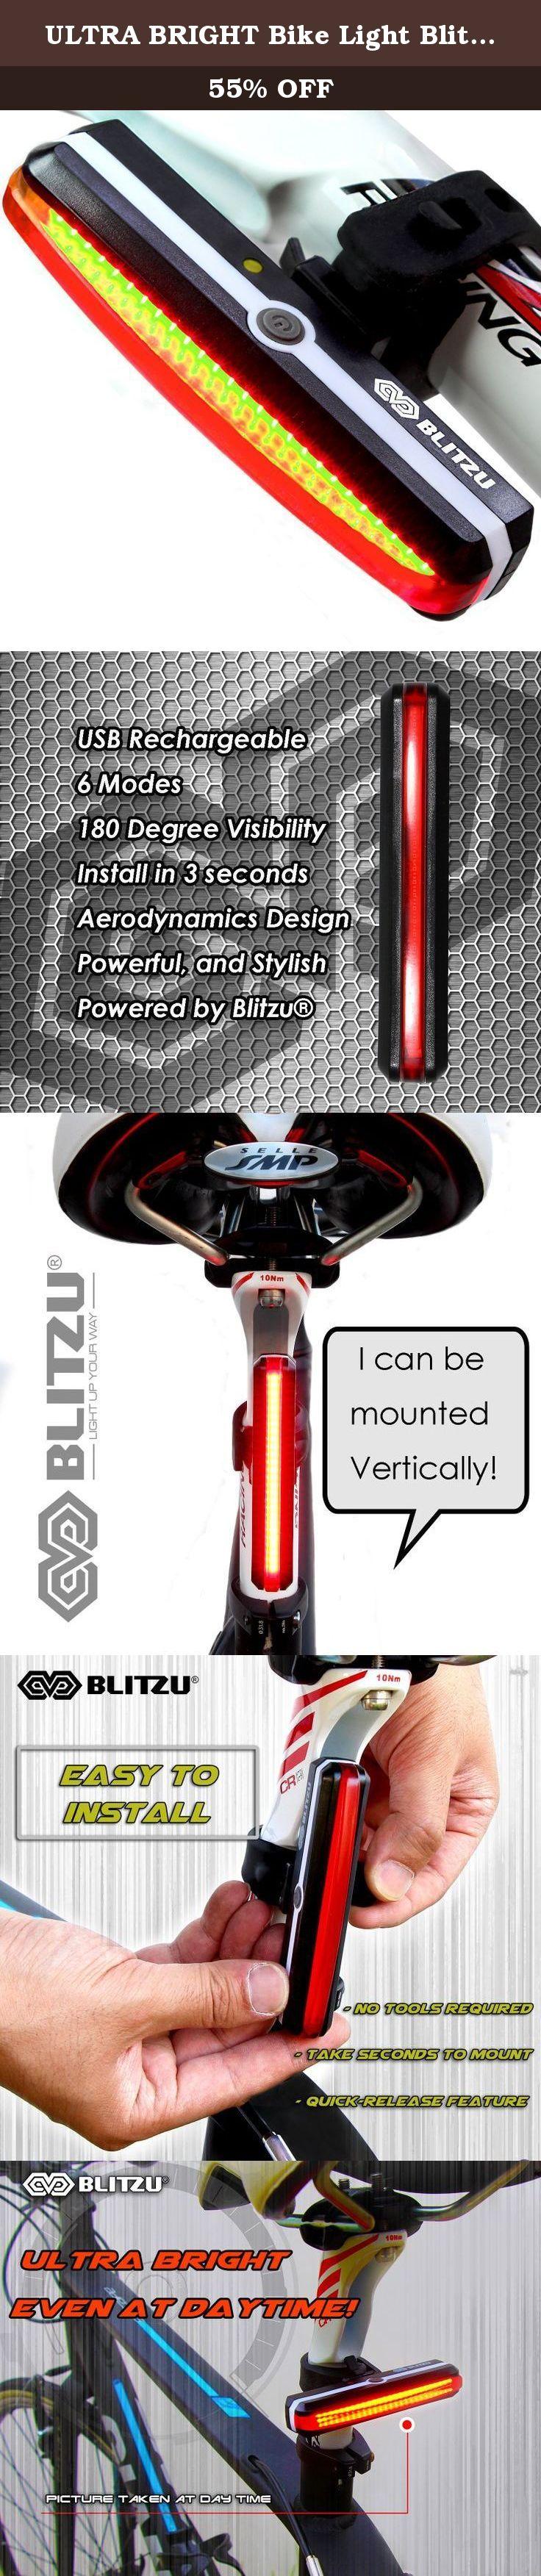 BLITZU Ultra Bright Bike Light Cyborg 168T USB Rechargeable Bicycle Tail Ligh...